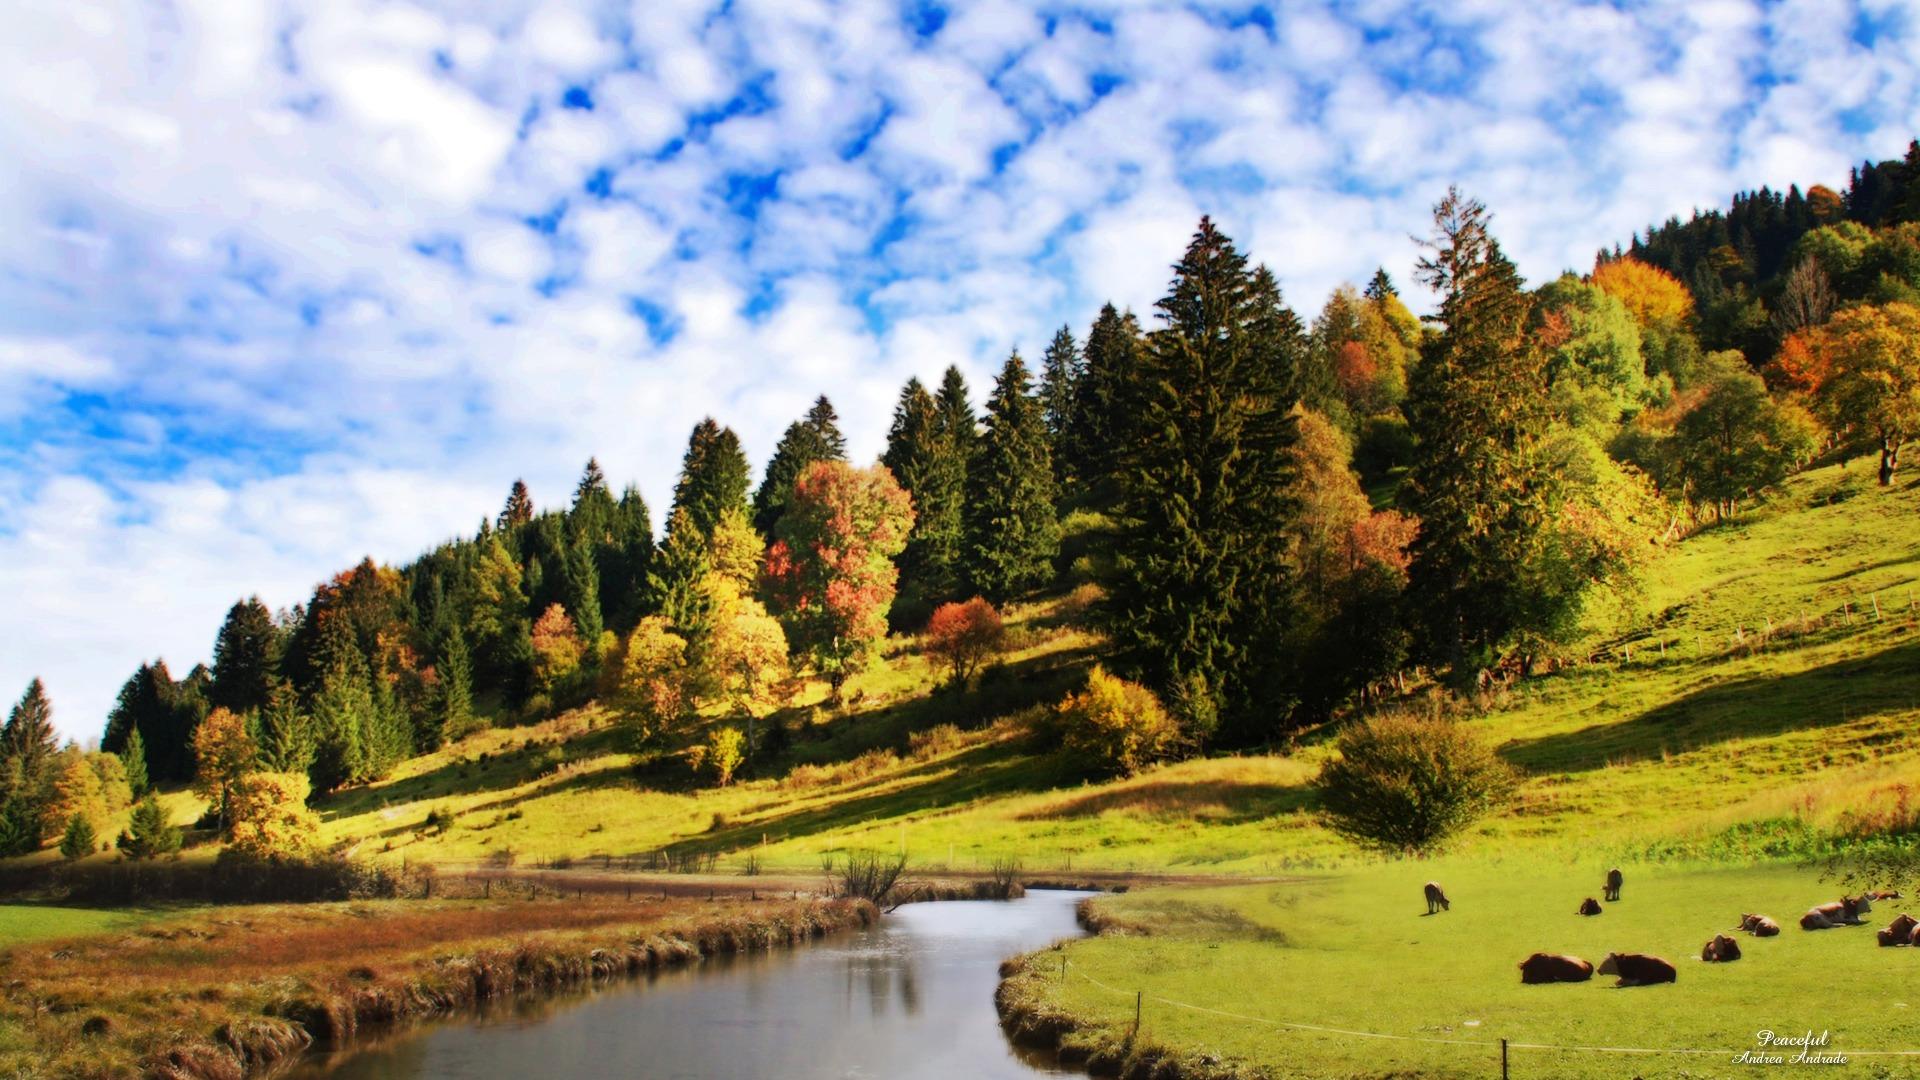 Peaceful Desktop Backgrounds Free Download: Peaceful Wallpaper Landscape Nature Wallpapers In Jpg